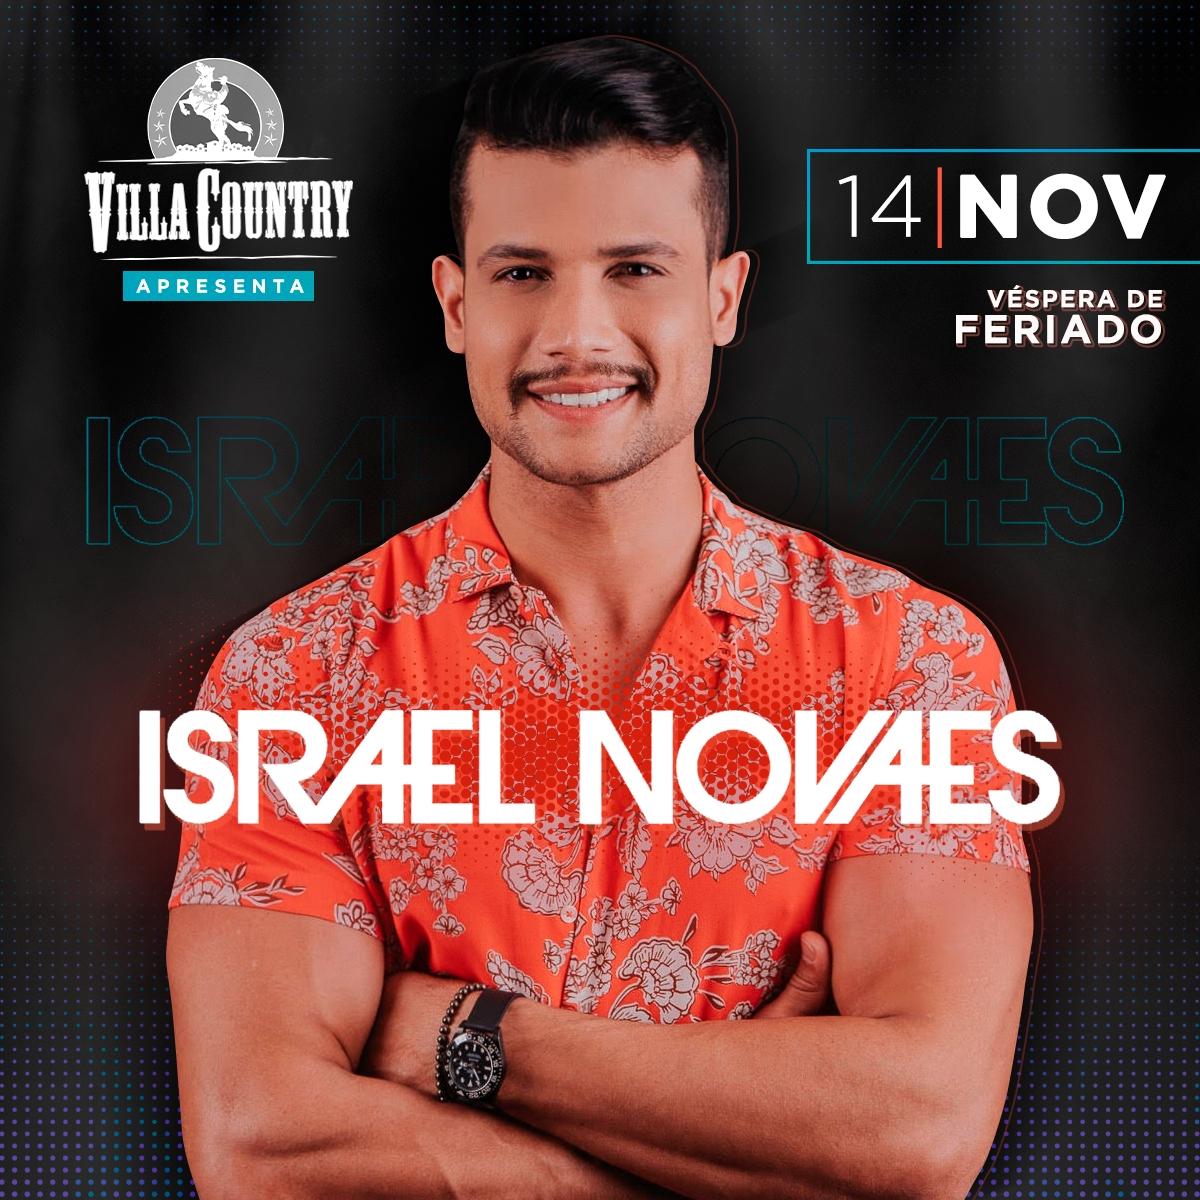 Israel Novaes mostra novos sucessos no Villa Country 41